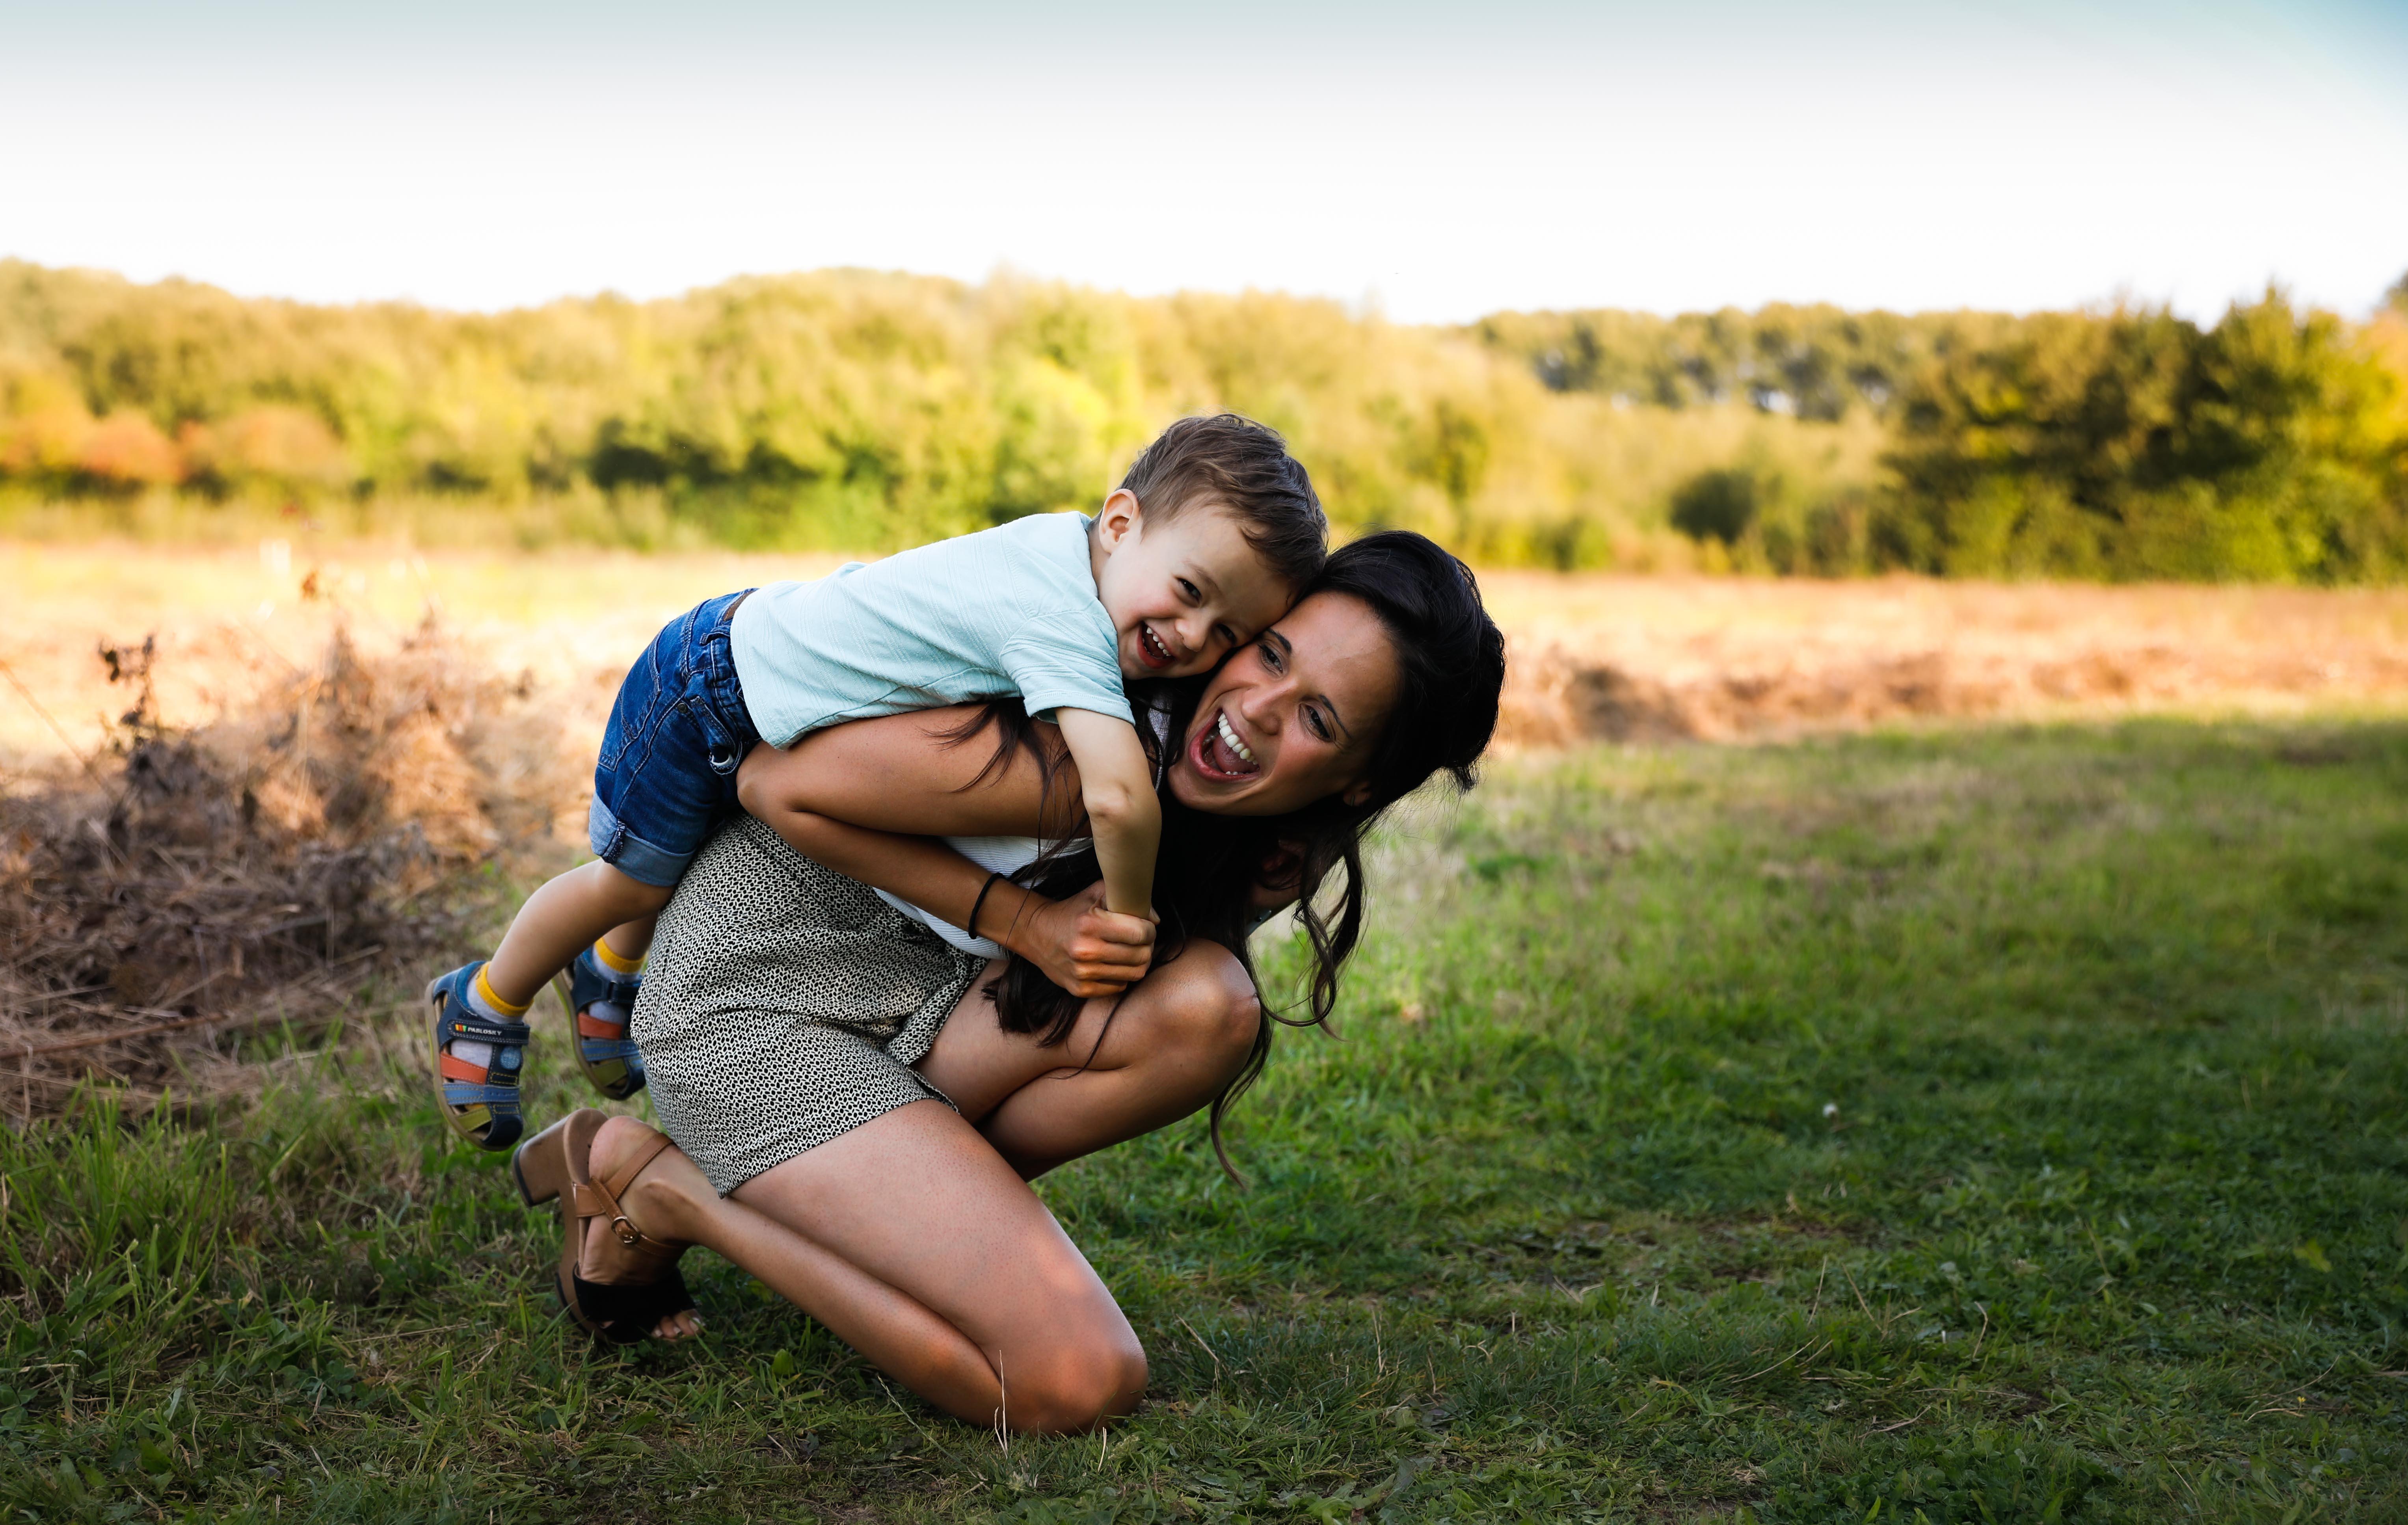 fotografíadefamilia-photofamille-familyphotography-familiefotografie